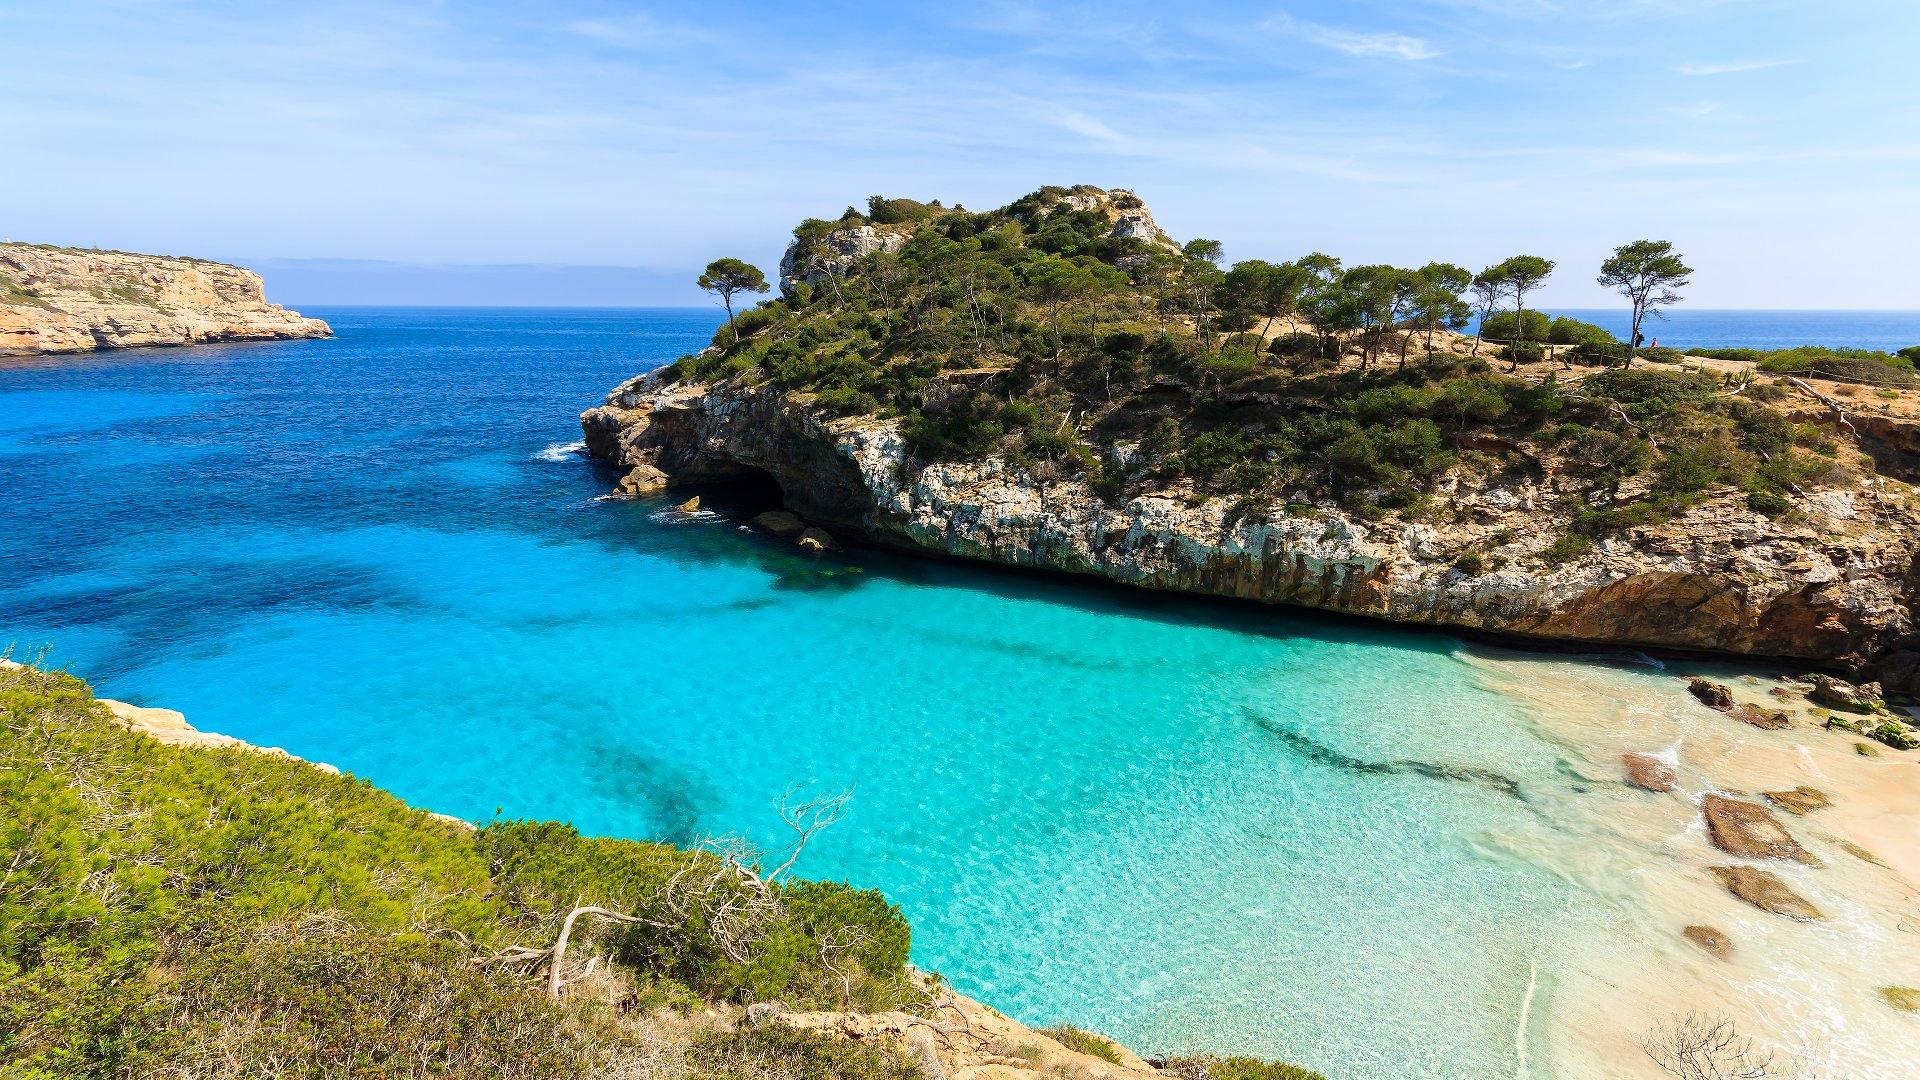 Cadillac Alquiler venta renting coches de lujo en Mallorca